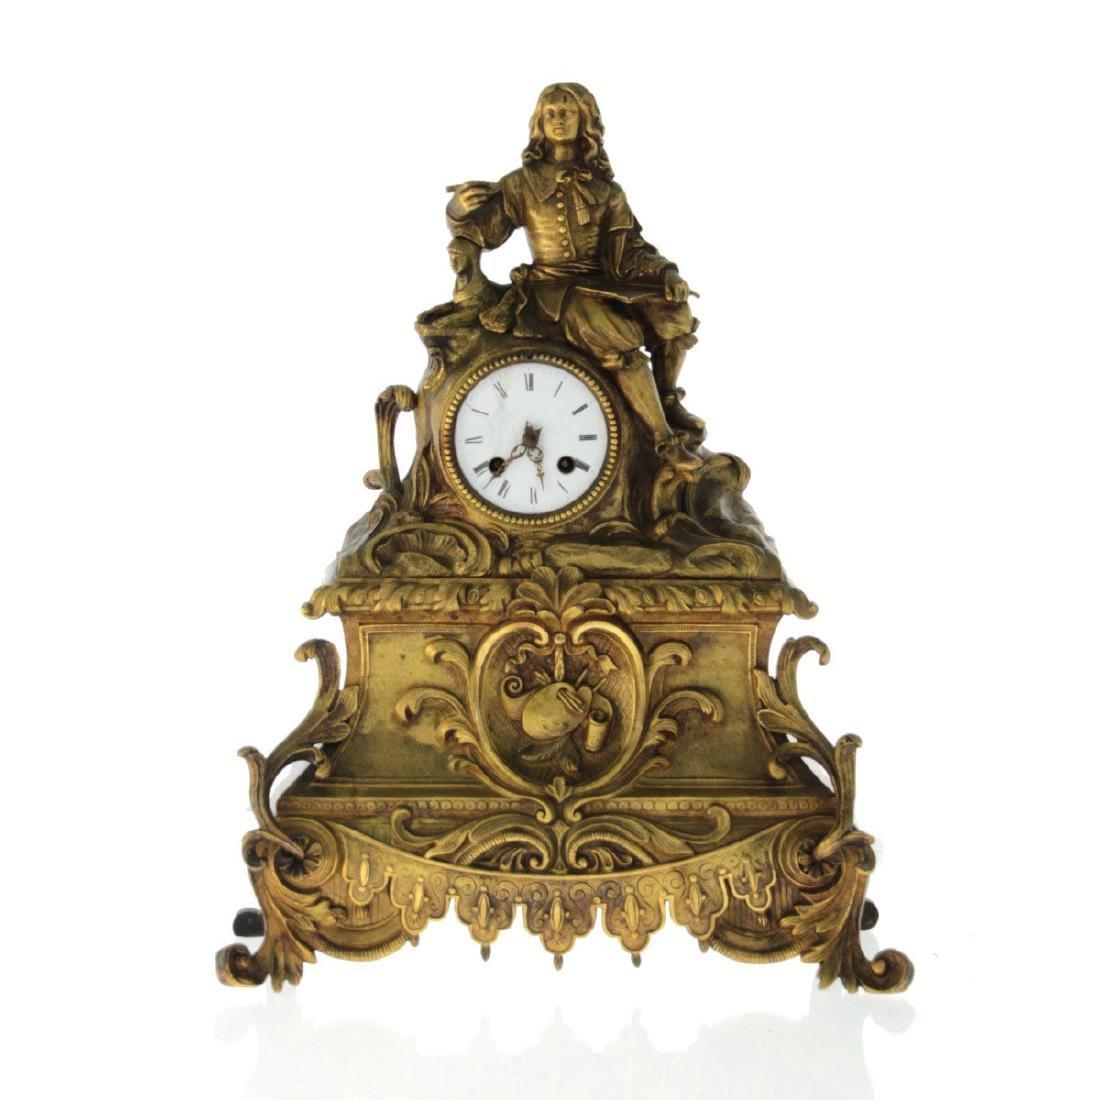 French Brass Mantel Clock, 19th Century.